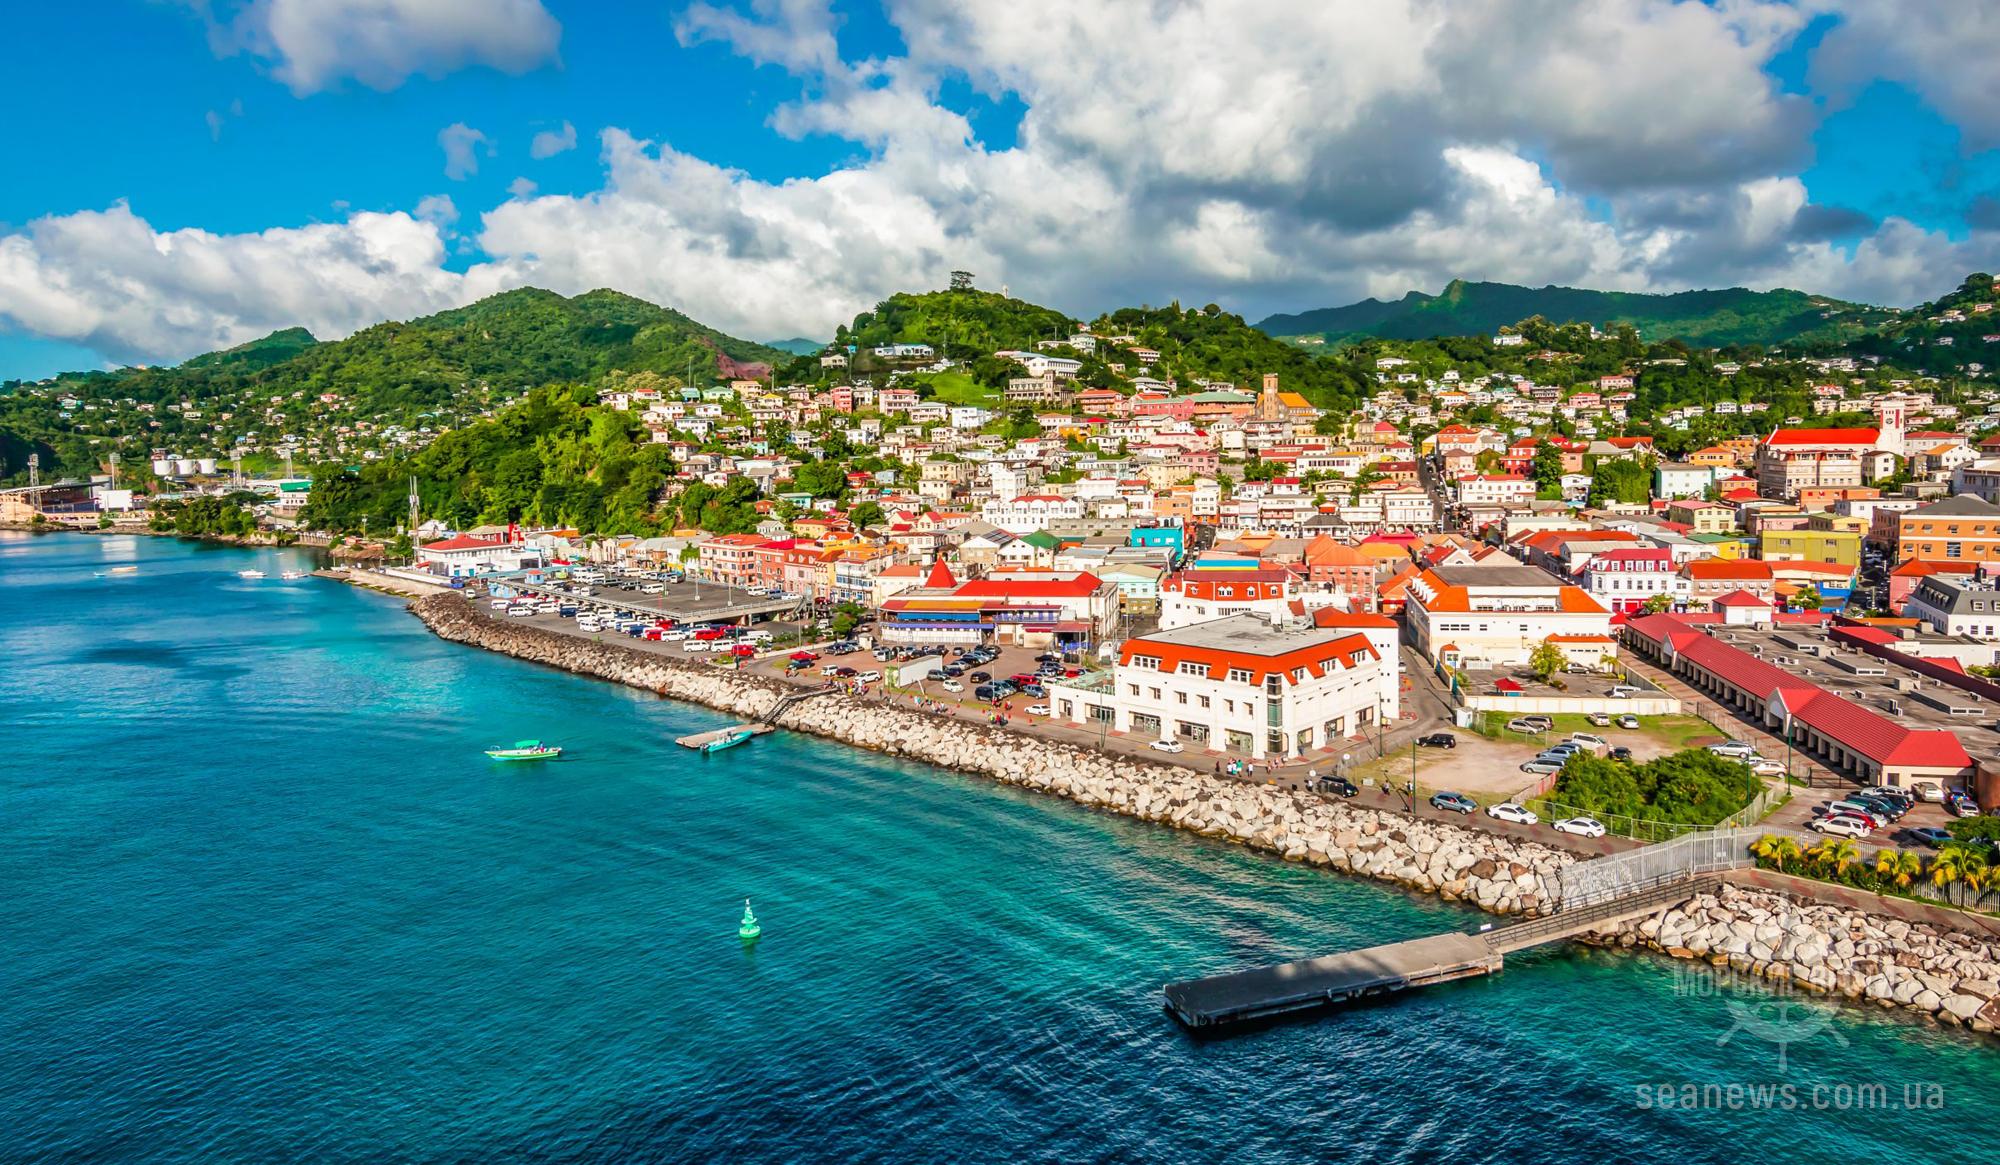 Украина вводит безвиз с тропическим раем в Карибском море